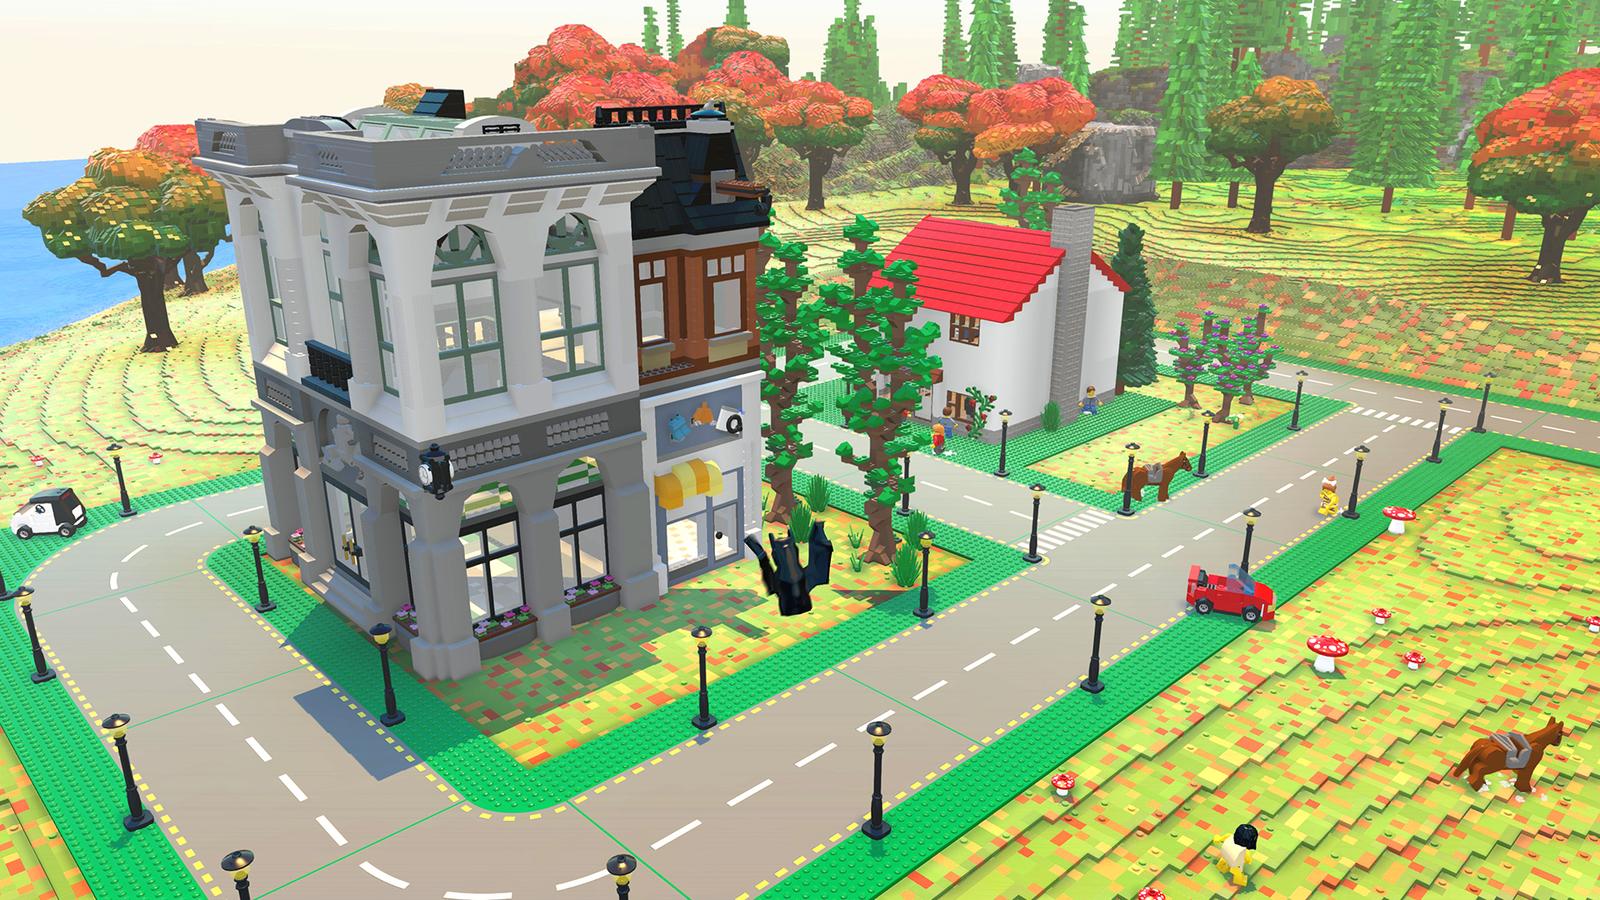 LEGO Worlds for Xbox One image